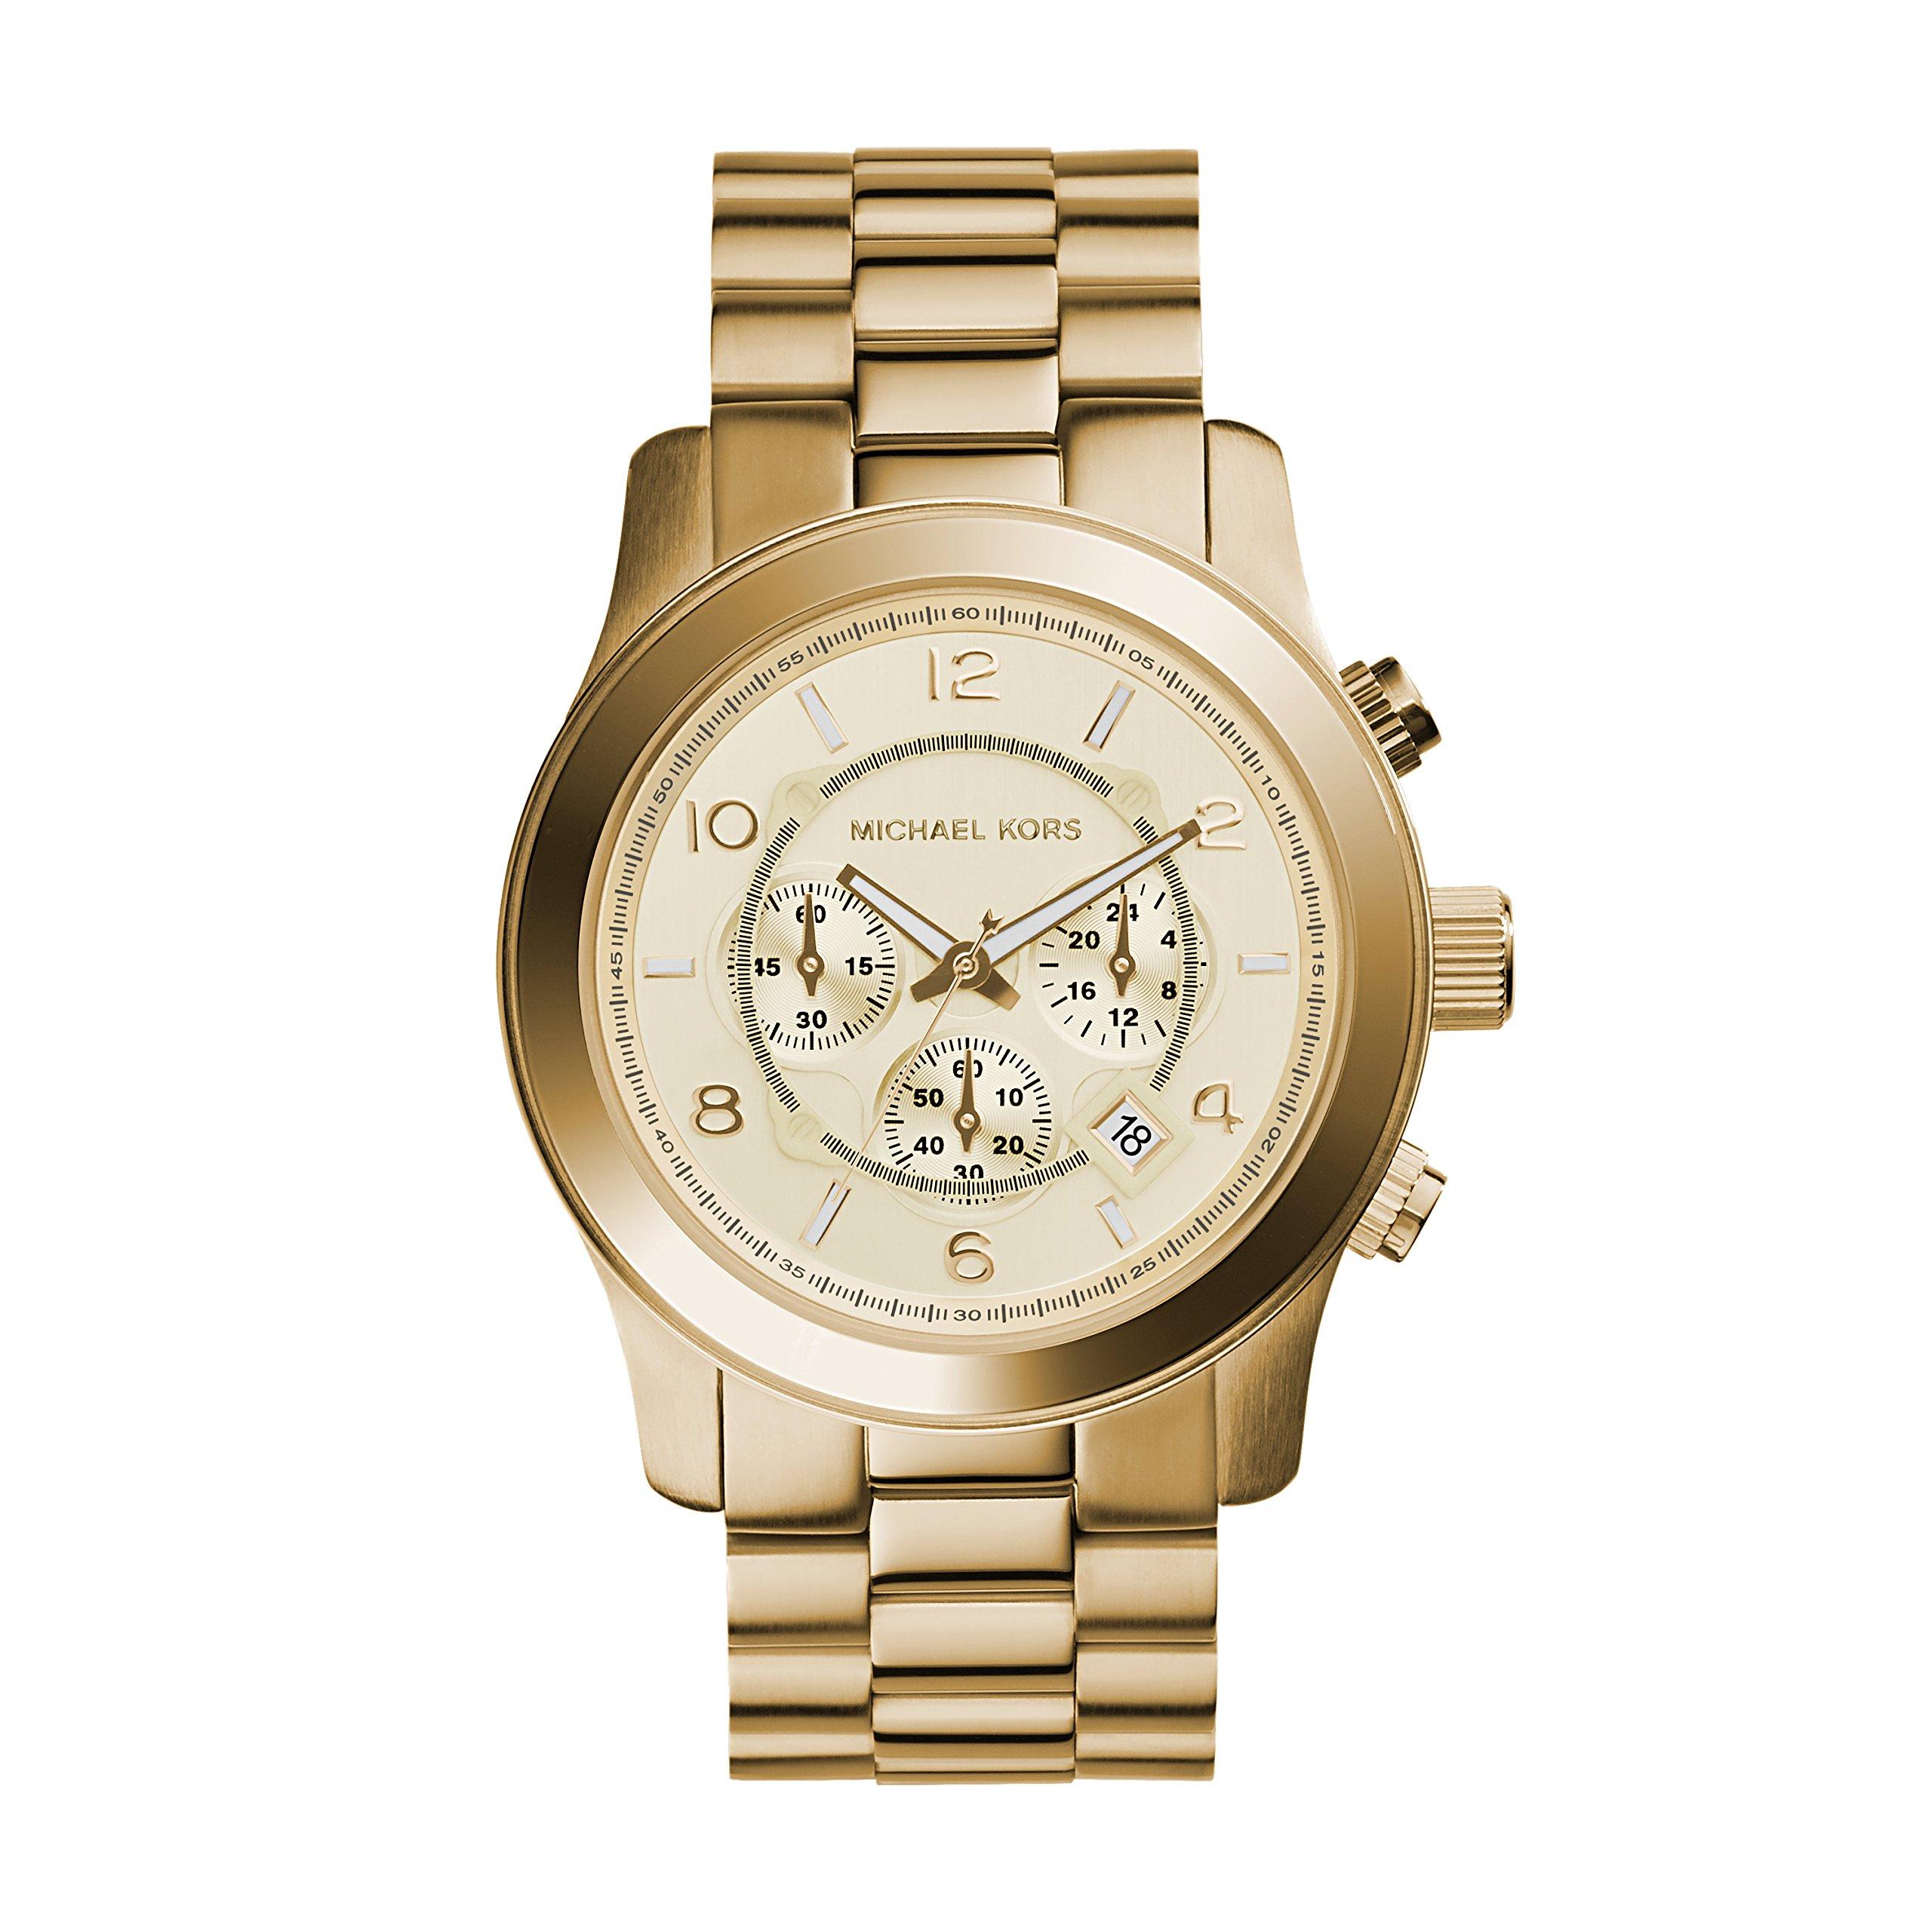 Michael Kors MK8077 Gold-Tone Men's Watch by Michael Kors